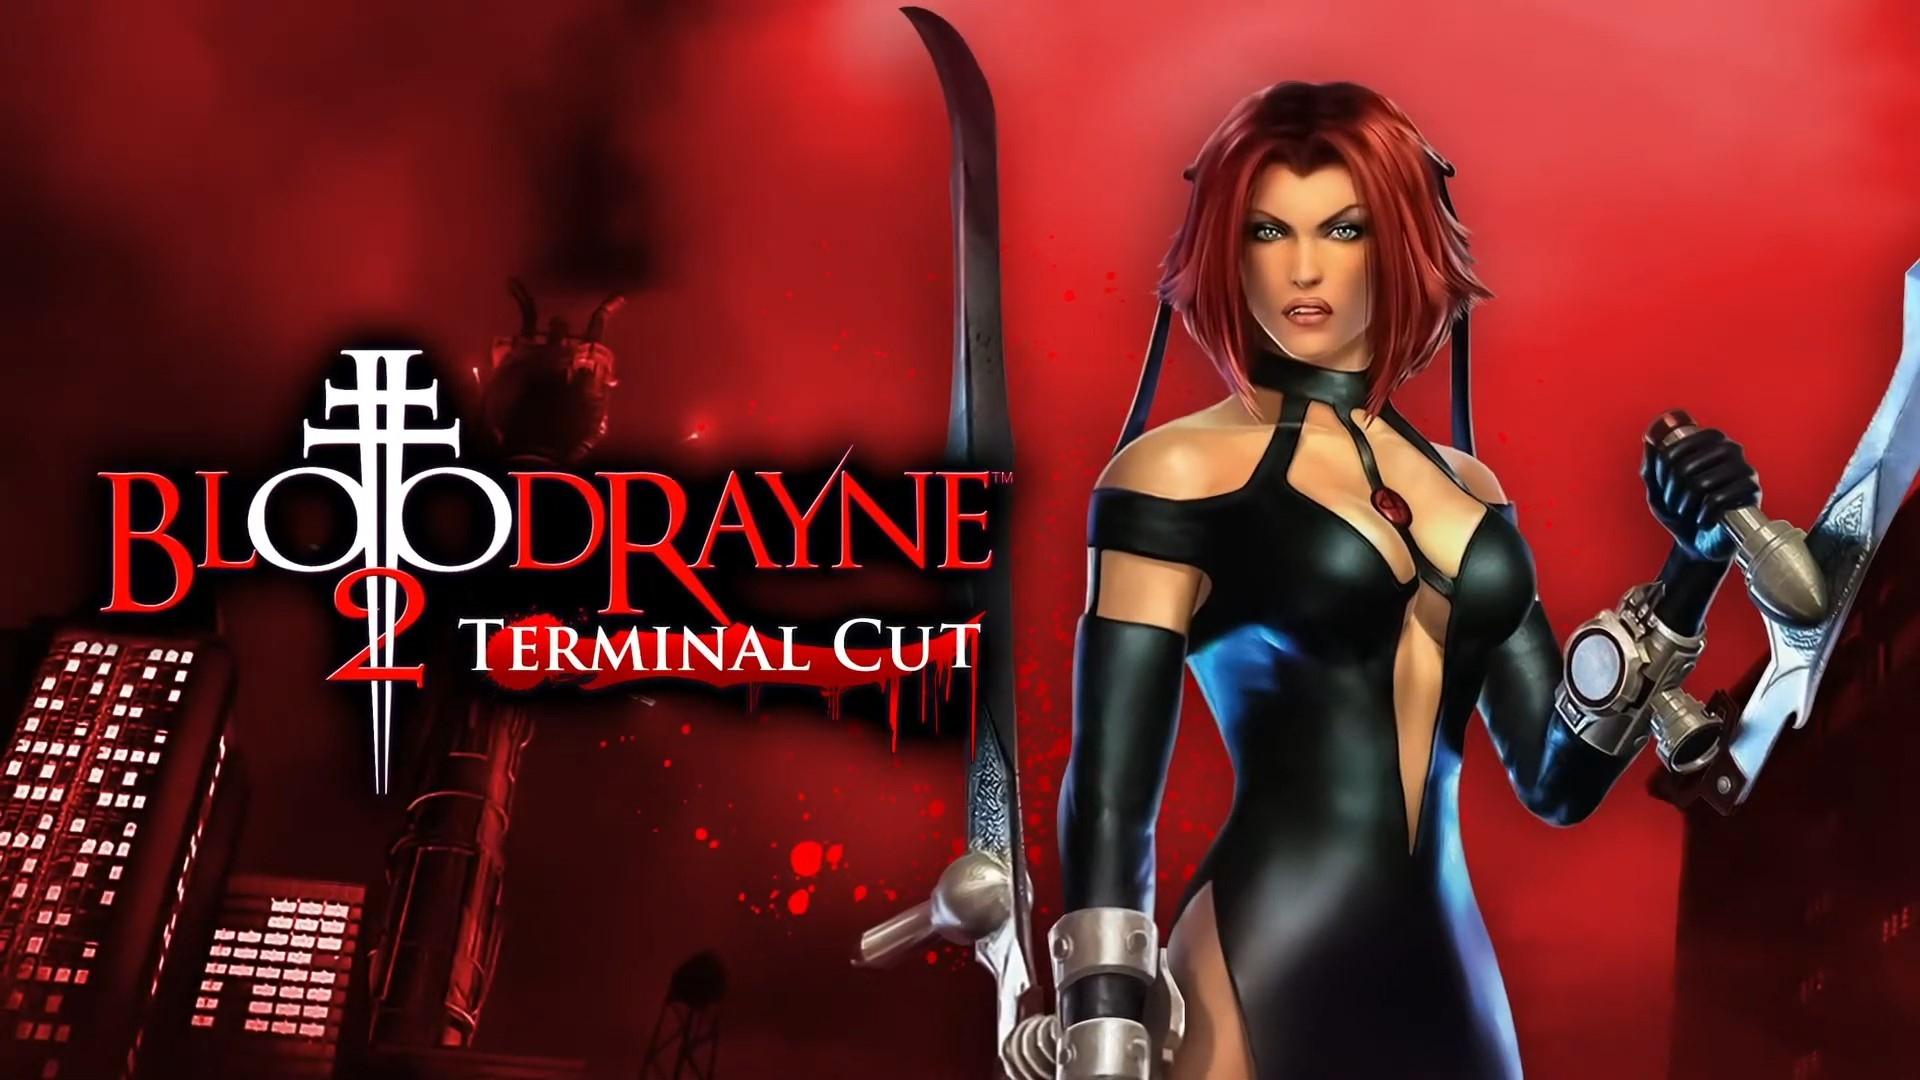 Bloodrayne 2 game quotes revel ac casino